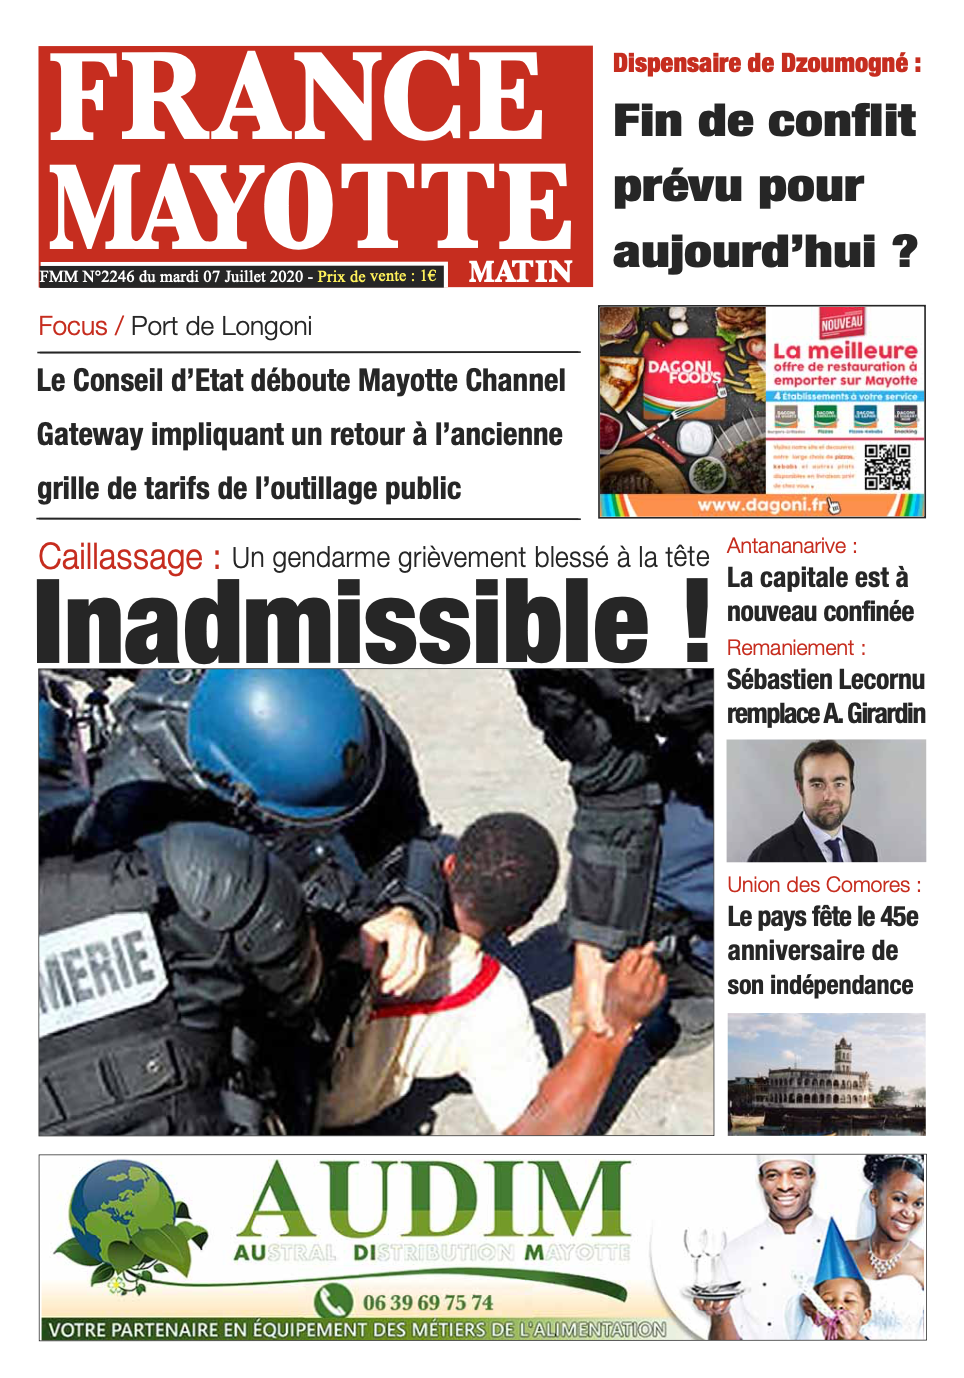 France Mayotte Mardi 7 juillet 2020